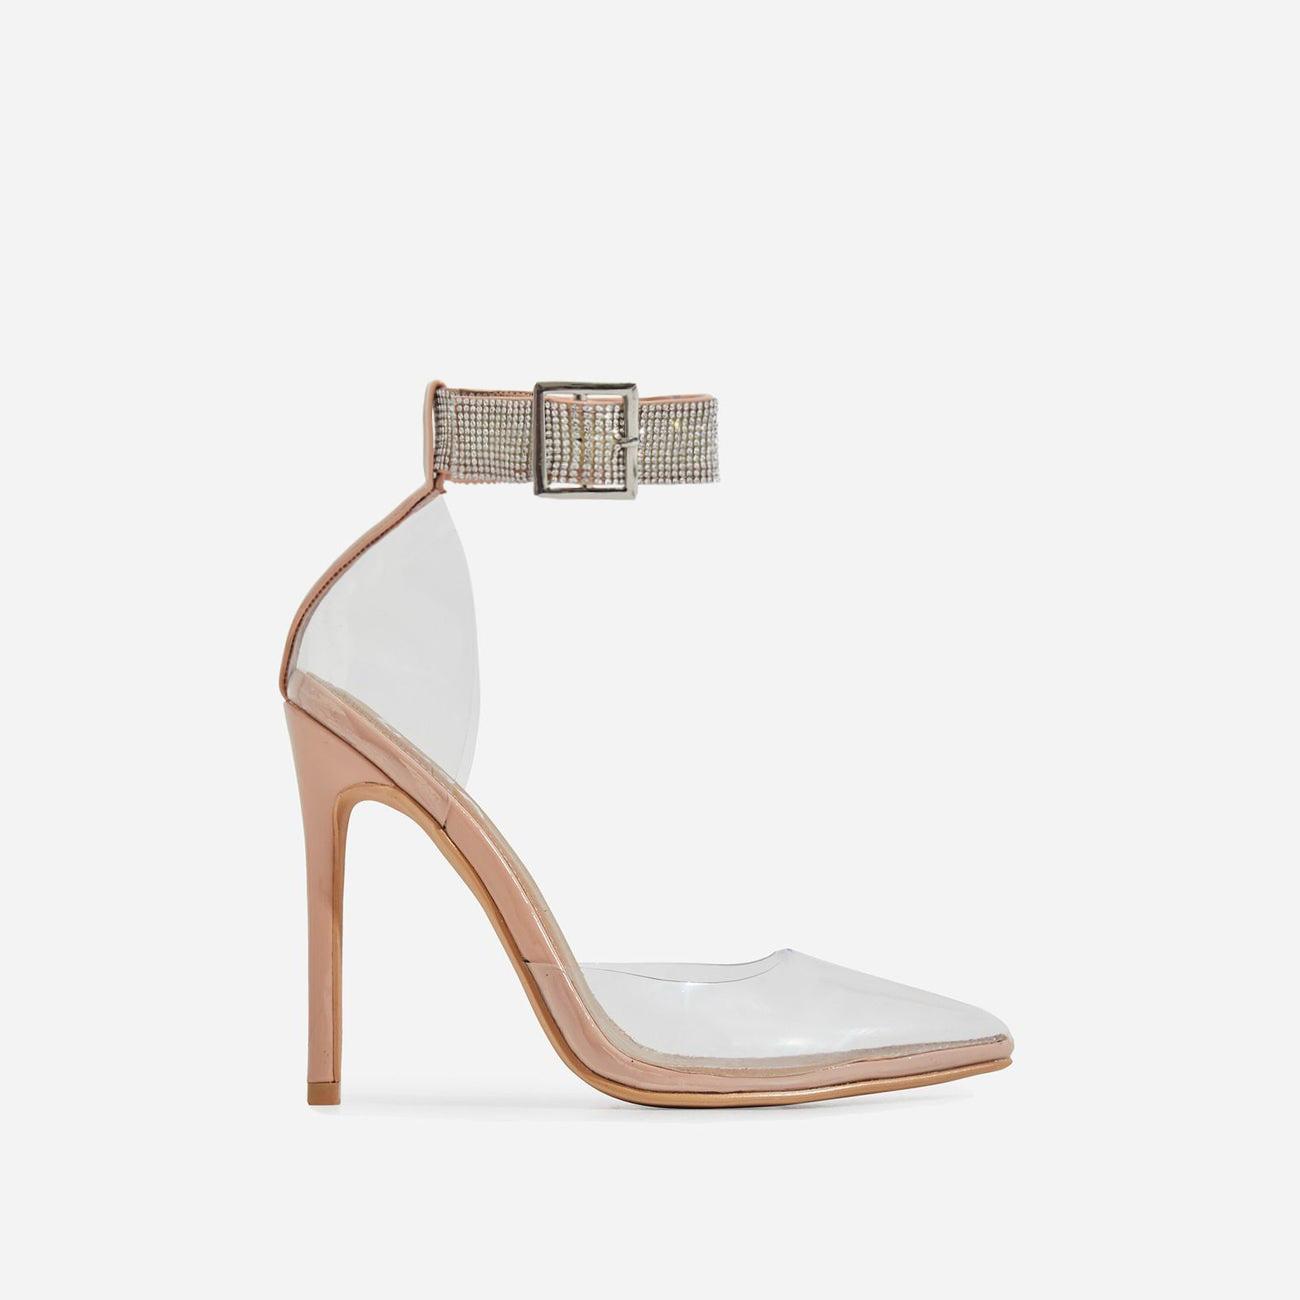 VIP Diamante Detail Strap Perspex Heel In Nude Patent